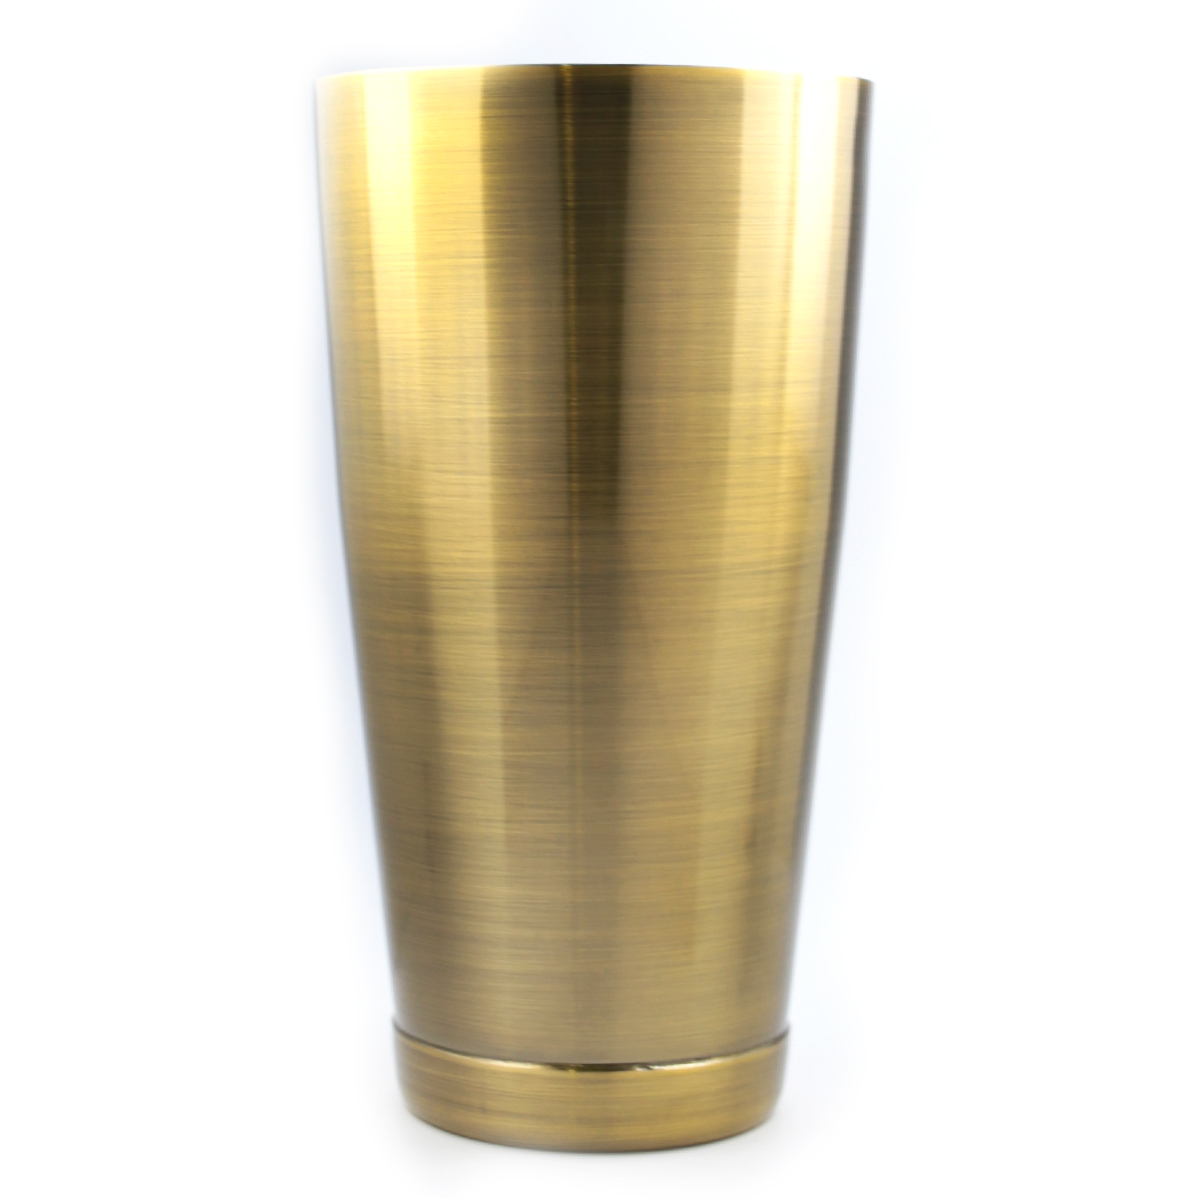 Boston Shaker - Large Antique Brass 28oz